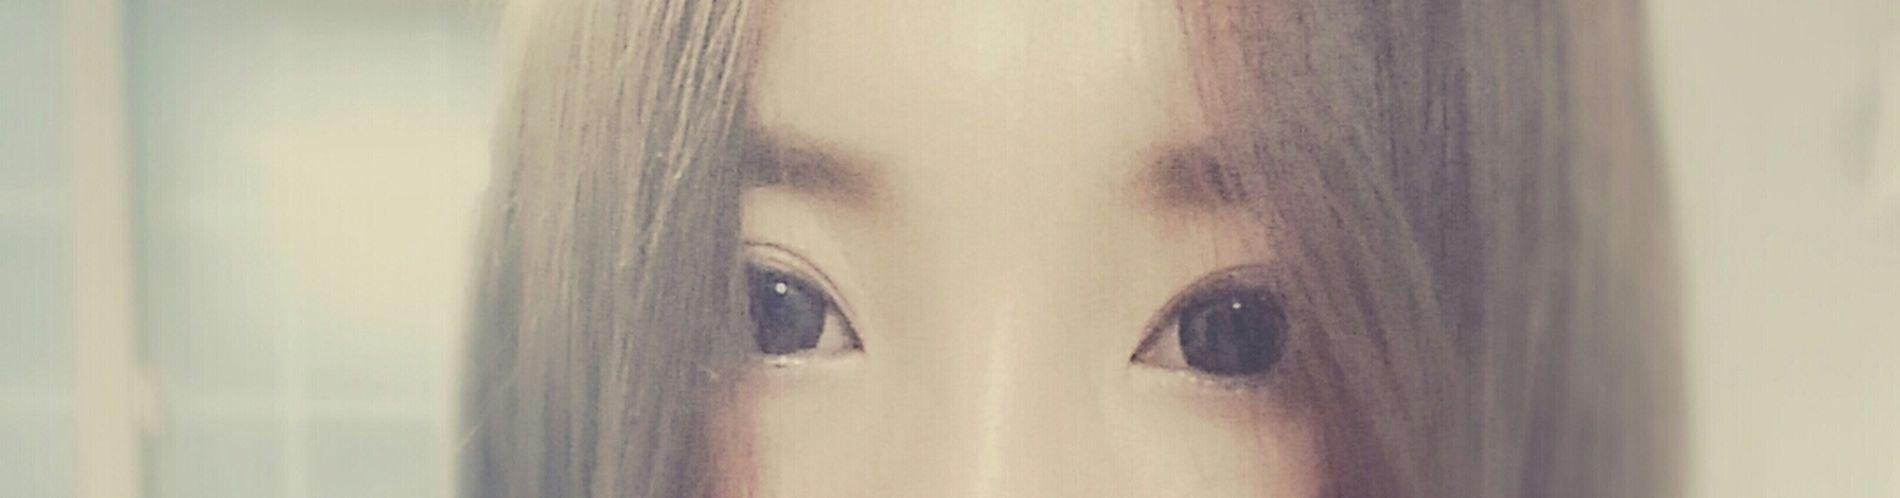 Eyes EyeEm Today Rainy Days Look At Me Right Now Sad & Lonely Alone Korean